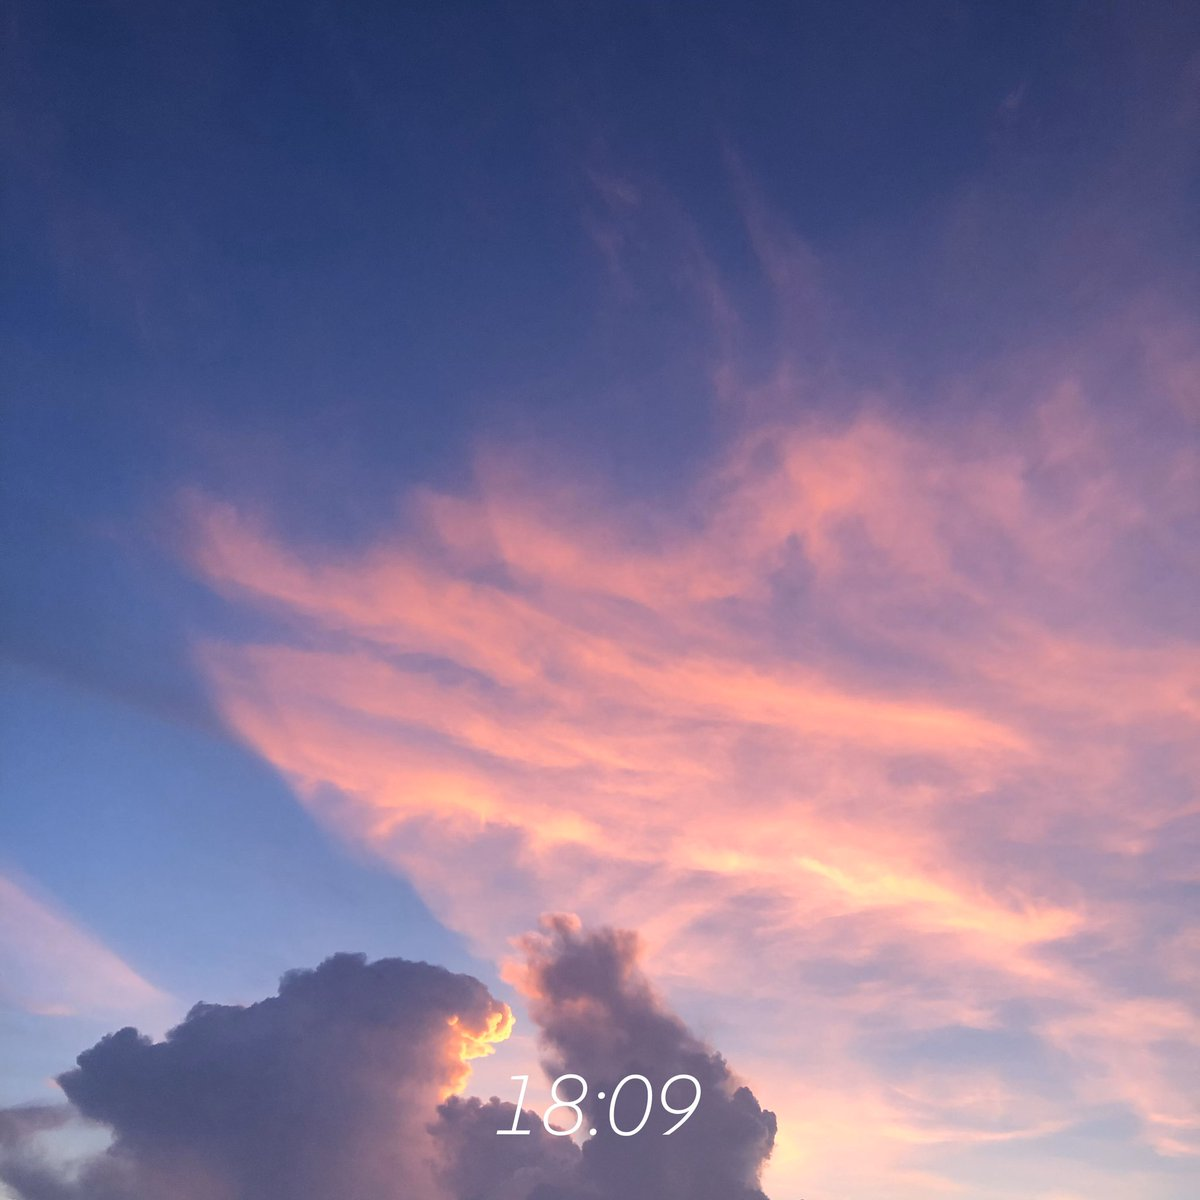 RT @mieuxakira: เรียงลำดับเวลาเปลี่ยนสีของเจ้าเมฆก๊อดซิล่า https://t.co/kPxTcOWruV